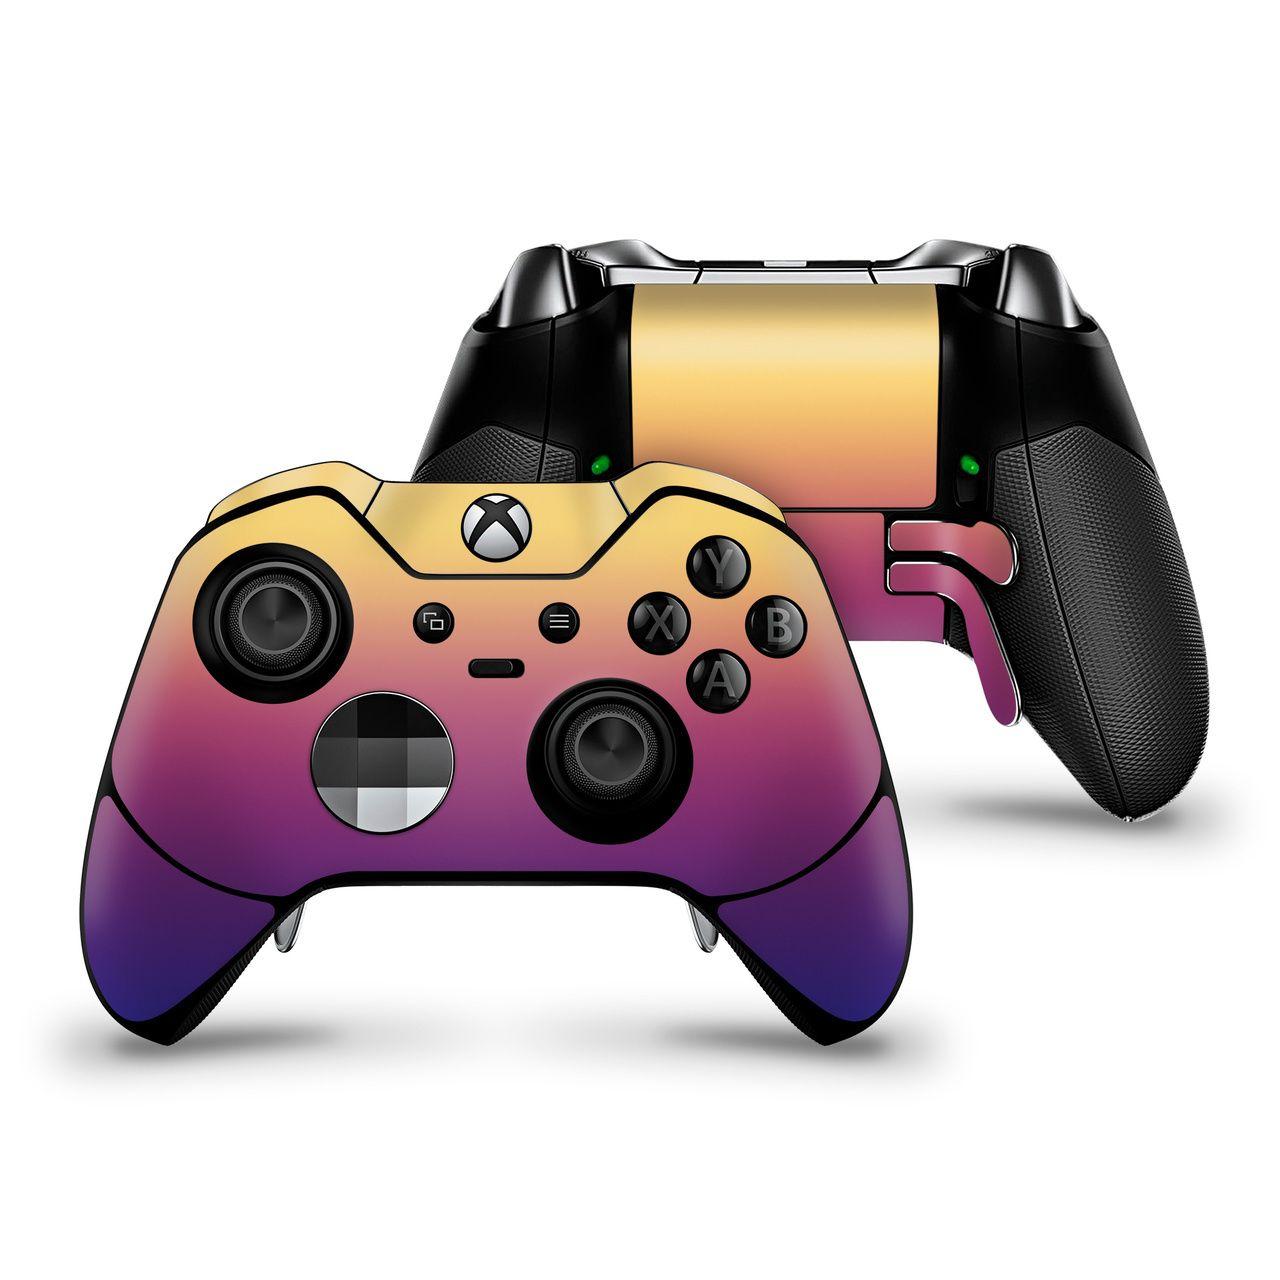 Fade Xbox One Elite Controller Skin | vlad | Xbox one, Xbox